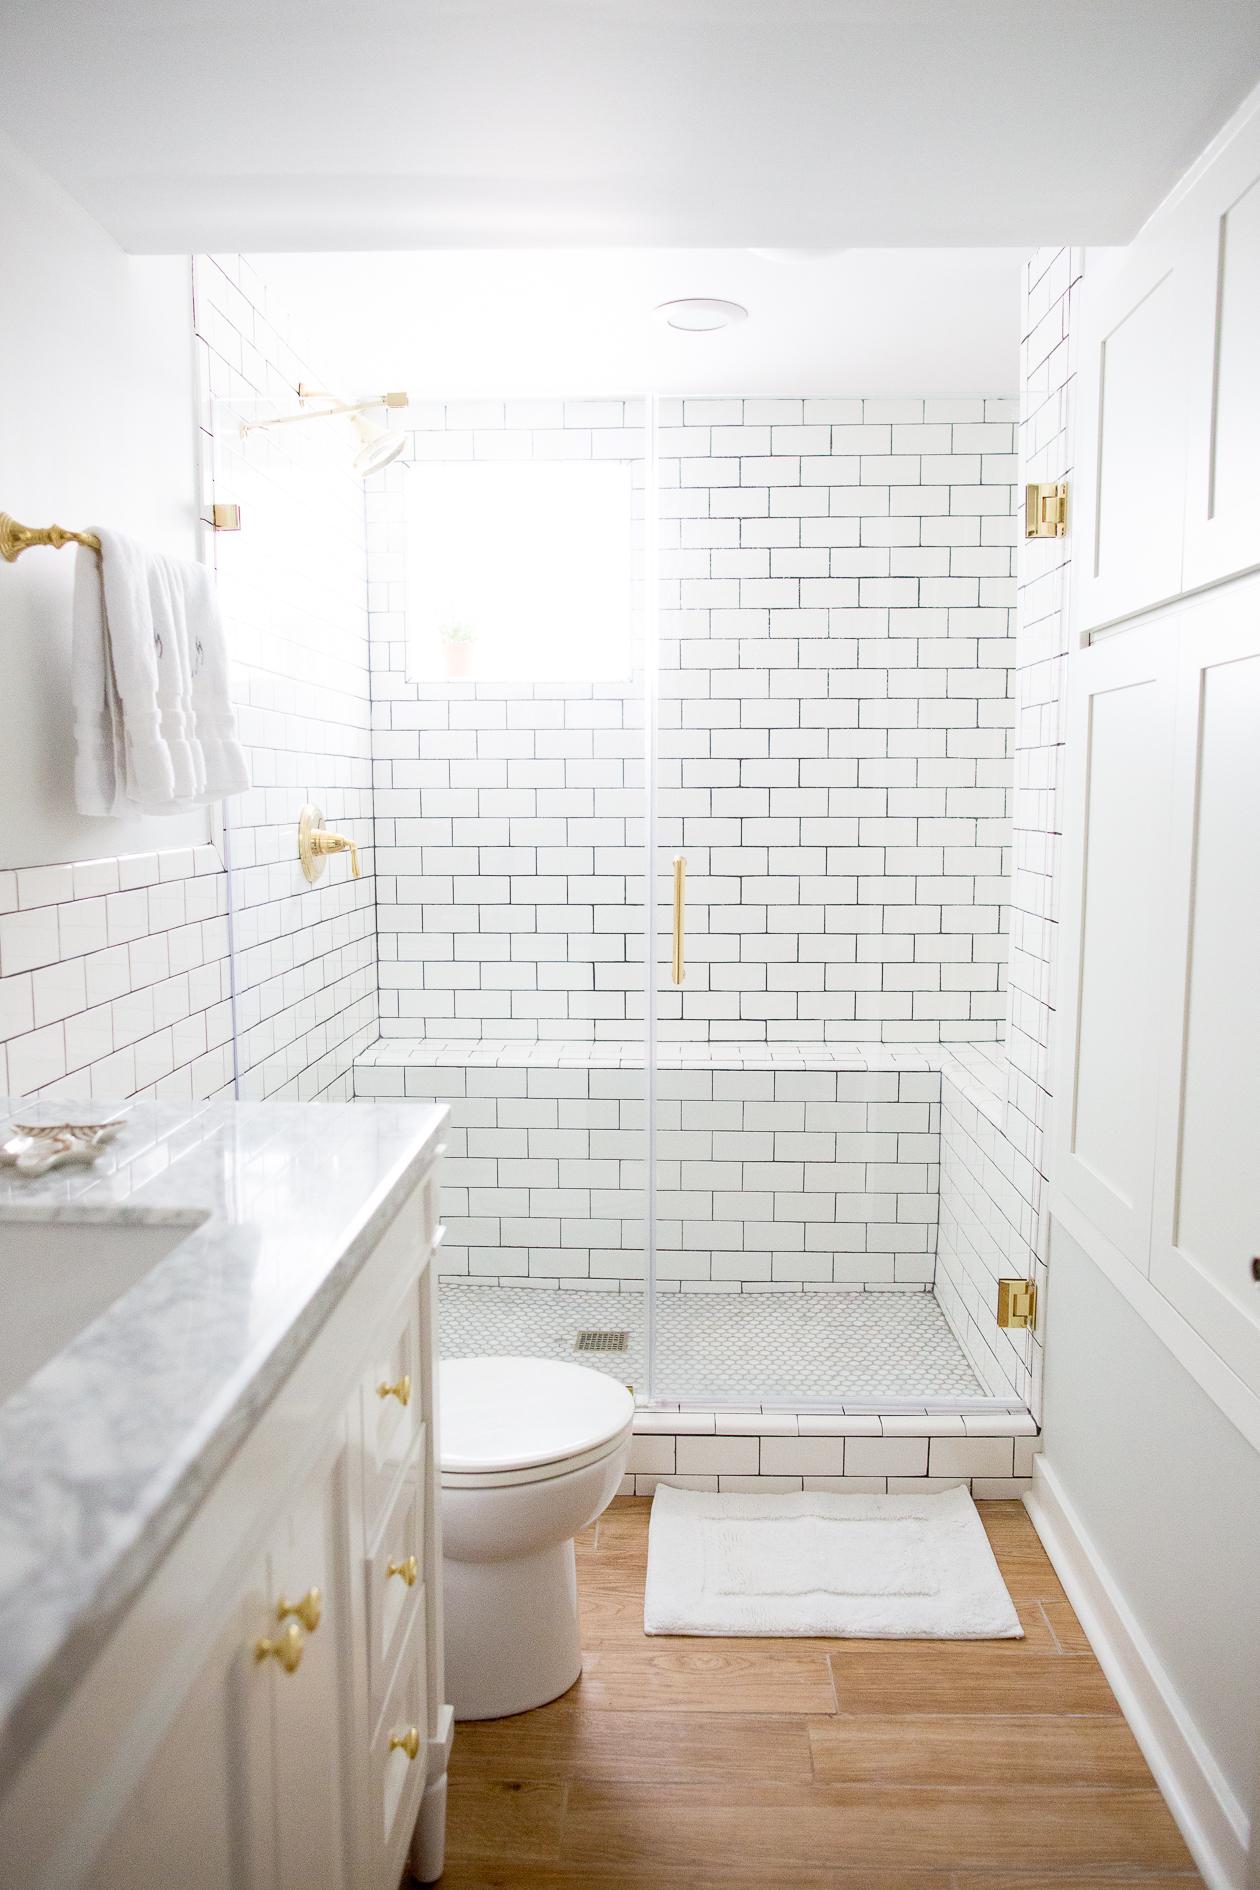 Kelly-in-the-City-Master-Bathroom-Renovation-81.jpg